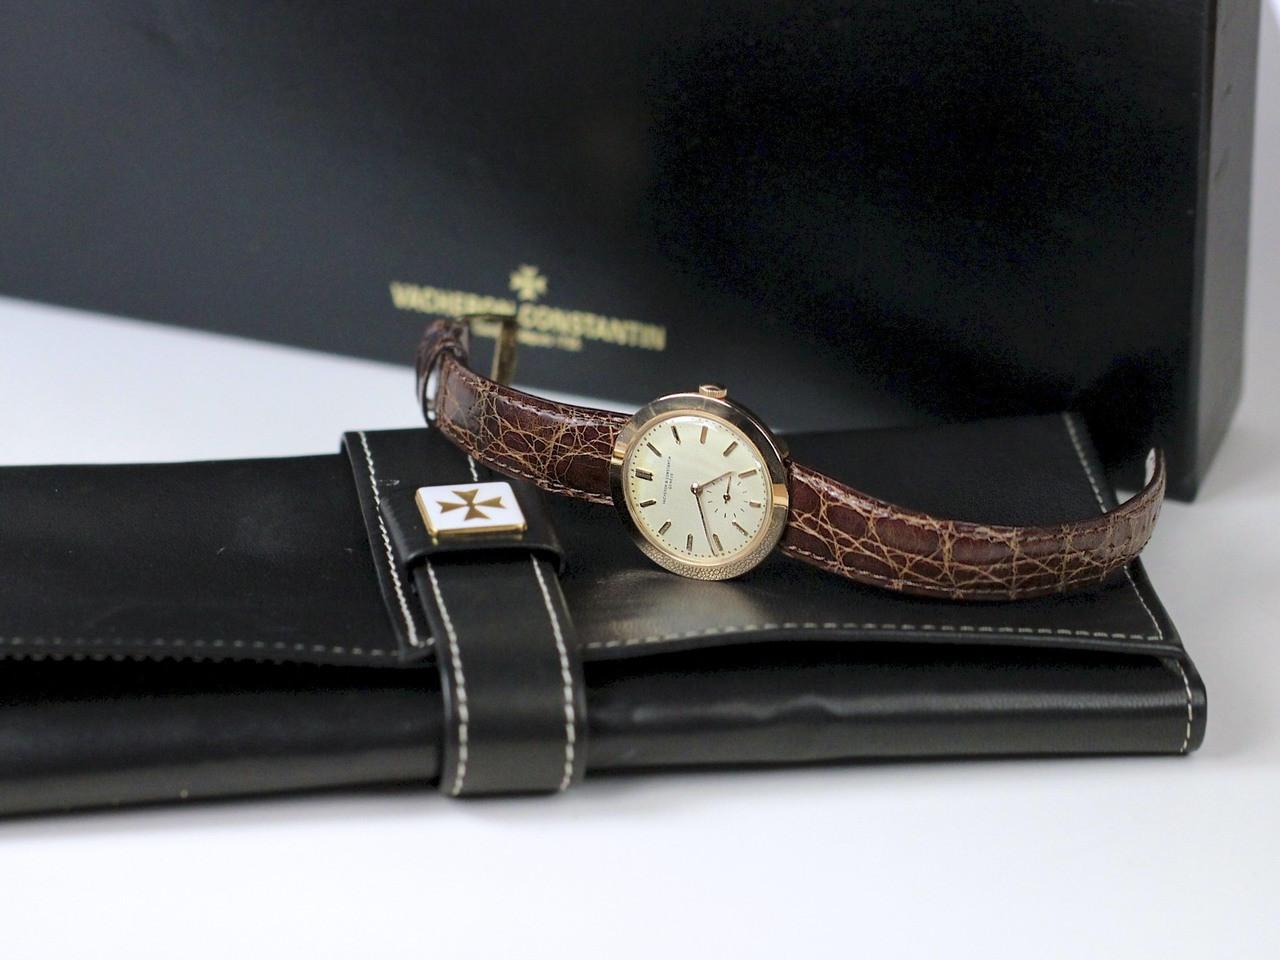 Travel Case & Box - Vintage Vacheron Constantin Vintage Gold Watch - www.Legendoftime.com - Chicago Watch Center